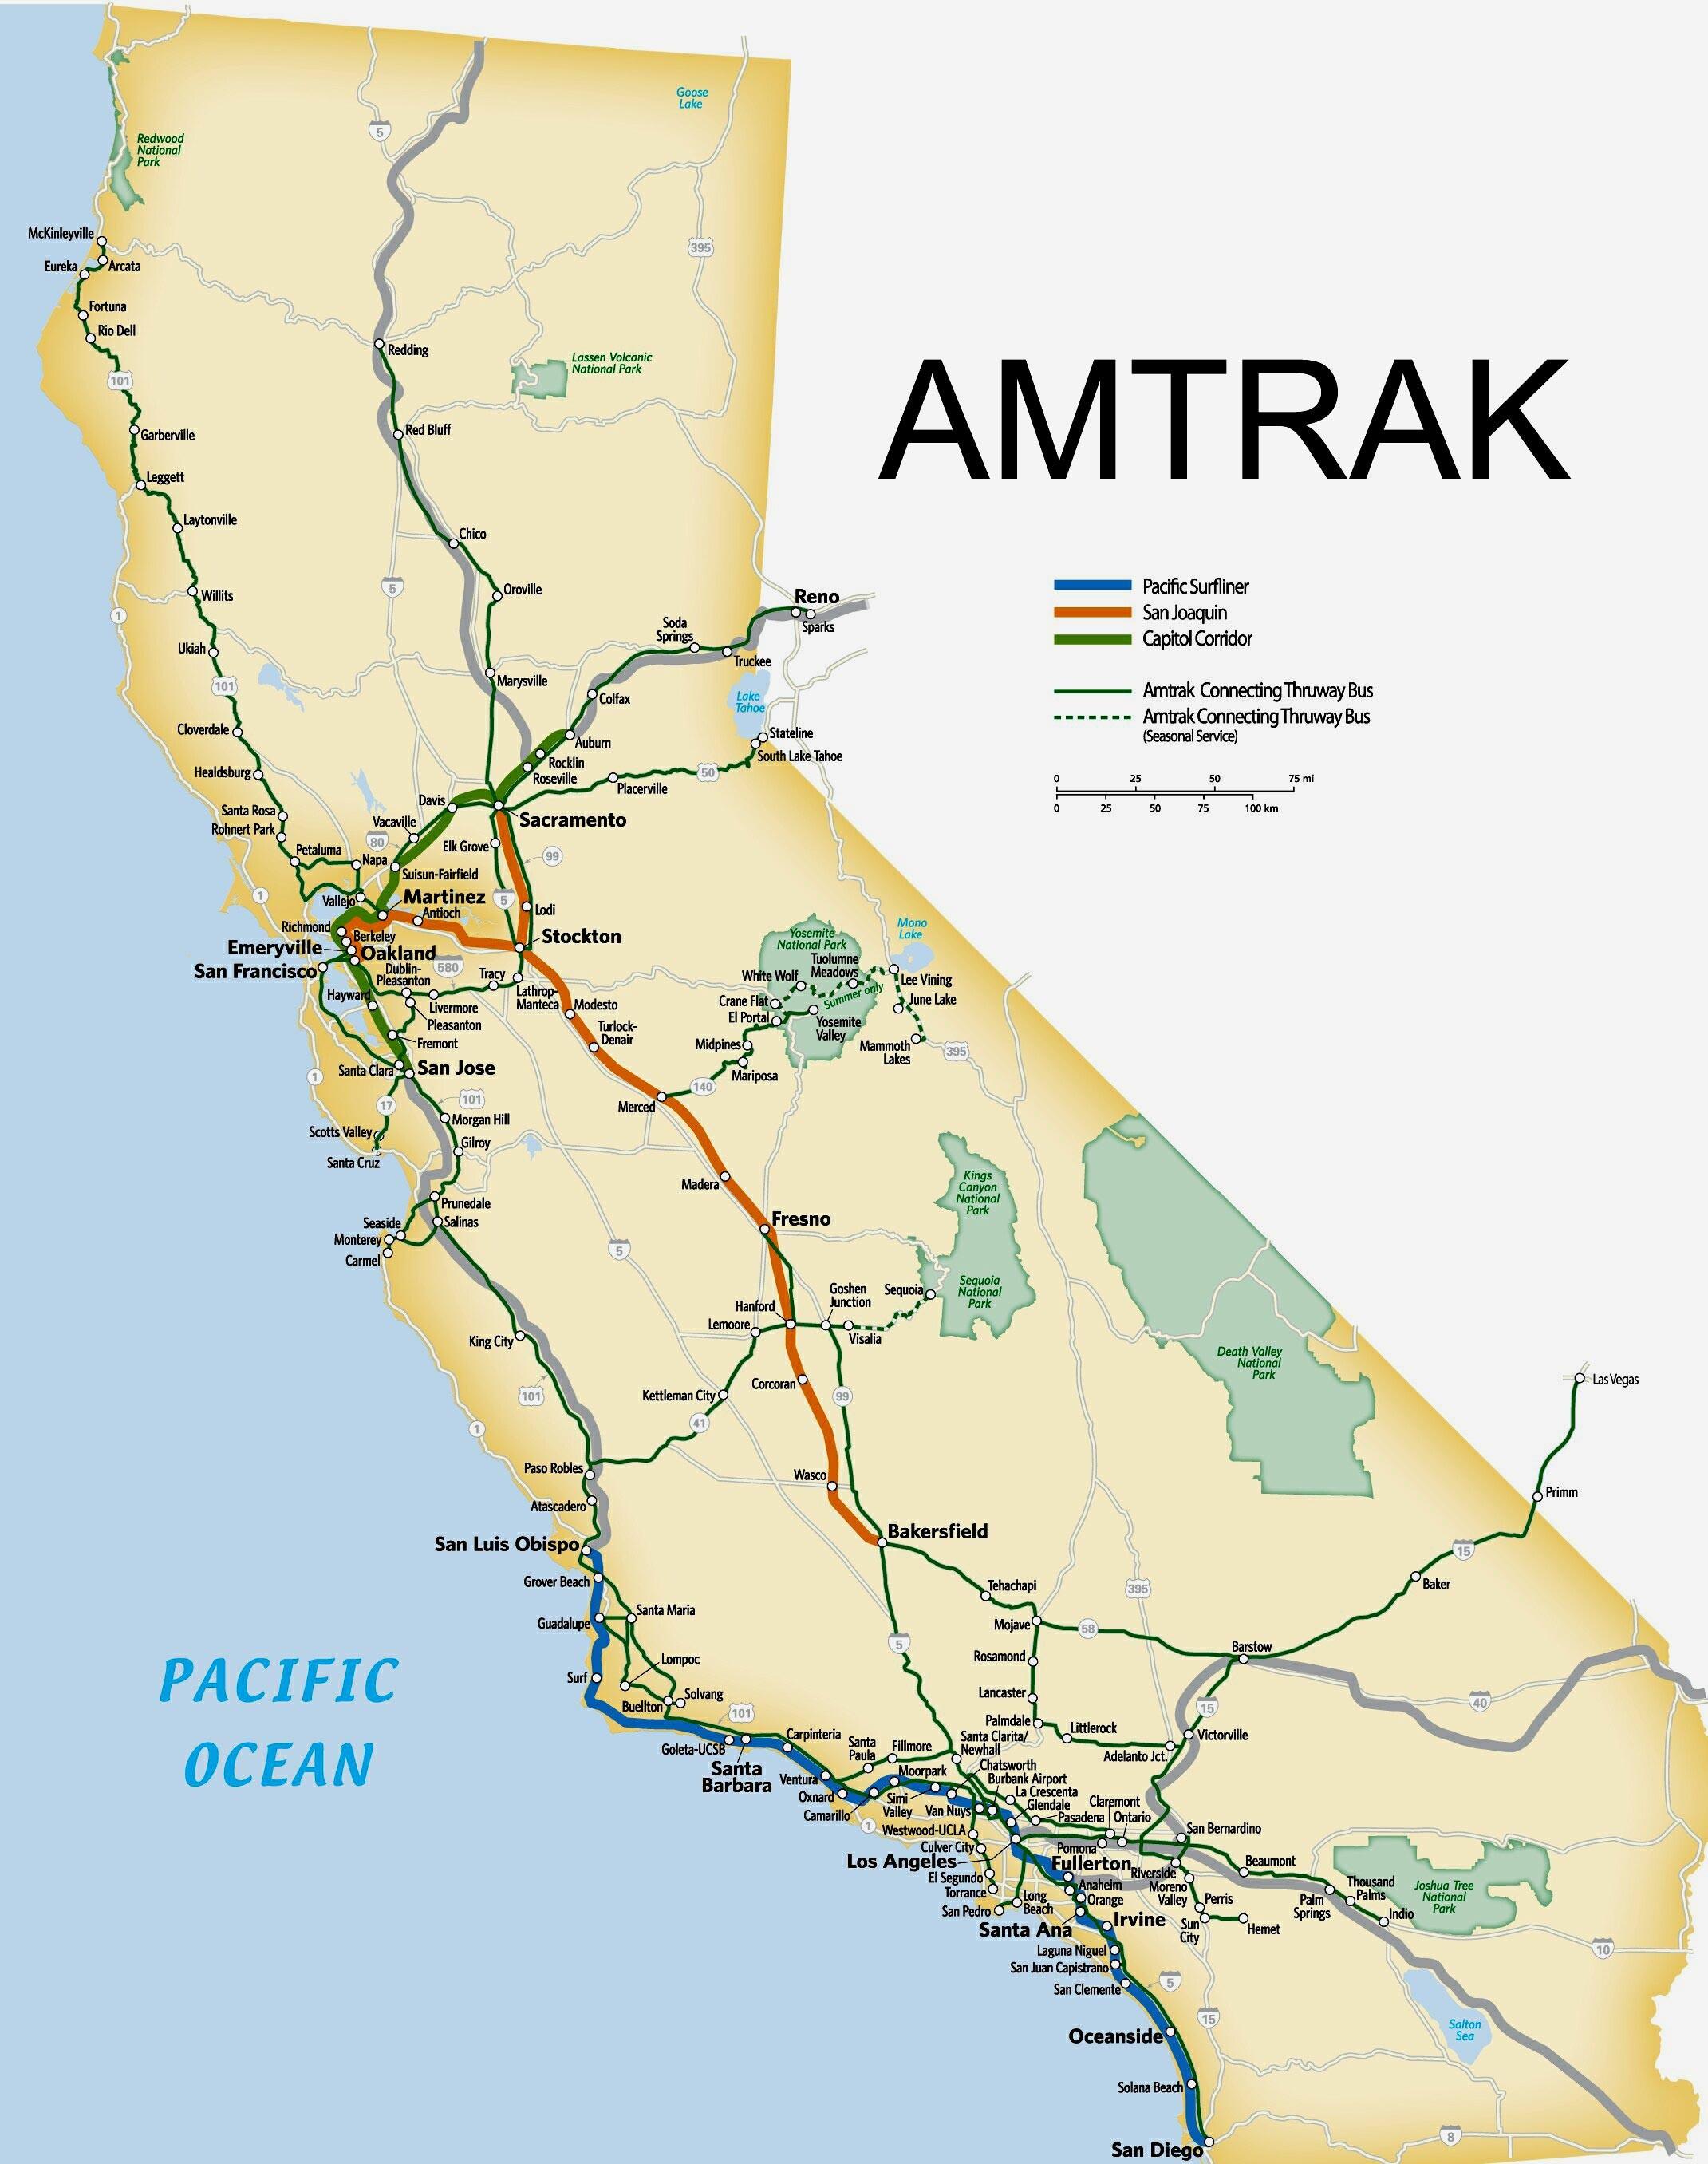 California Amtrak Stations Map - Ettcarworld - Amtrak Station Map Florida